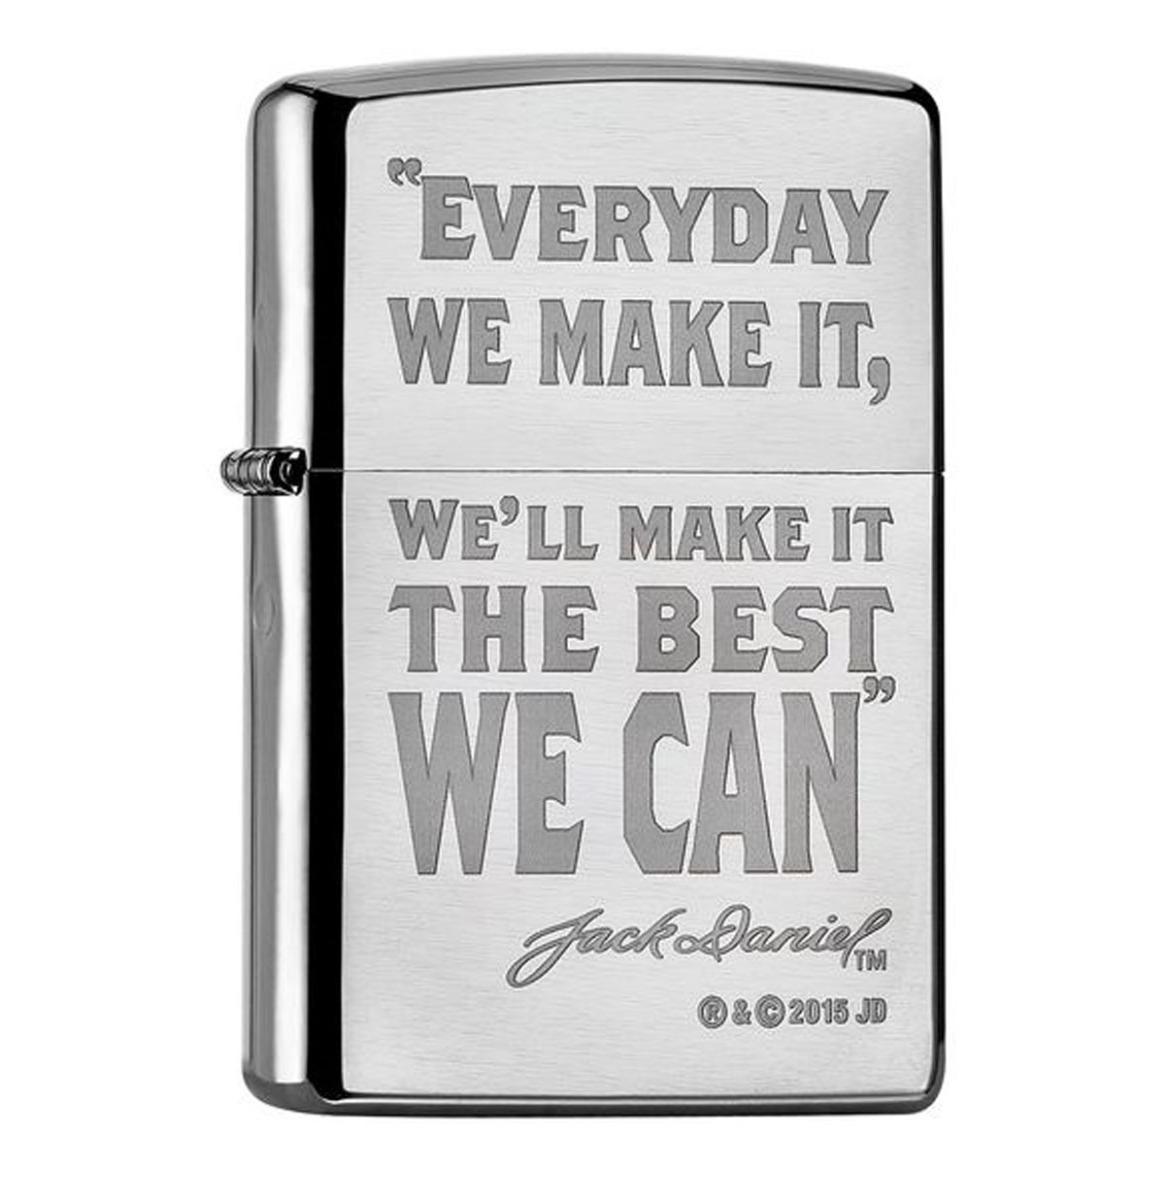 Zippo Aansteker Jack Daniel's Everyday We Make It, We'll Make It The Best We Can